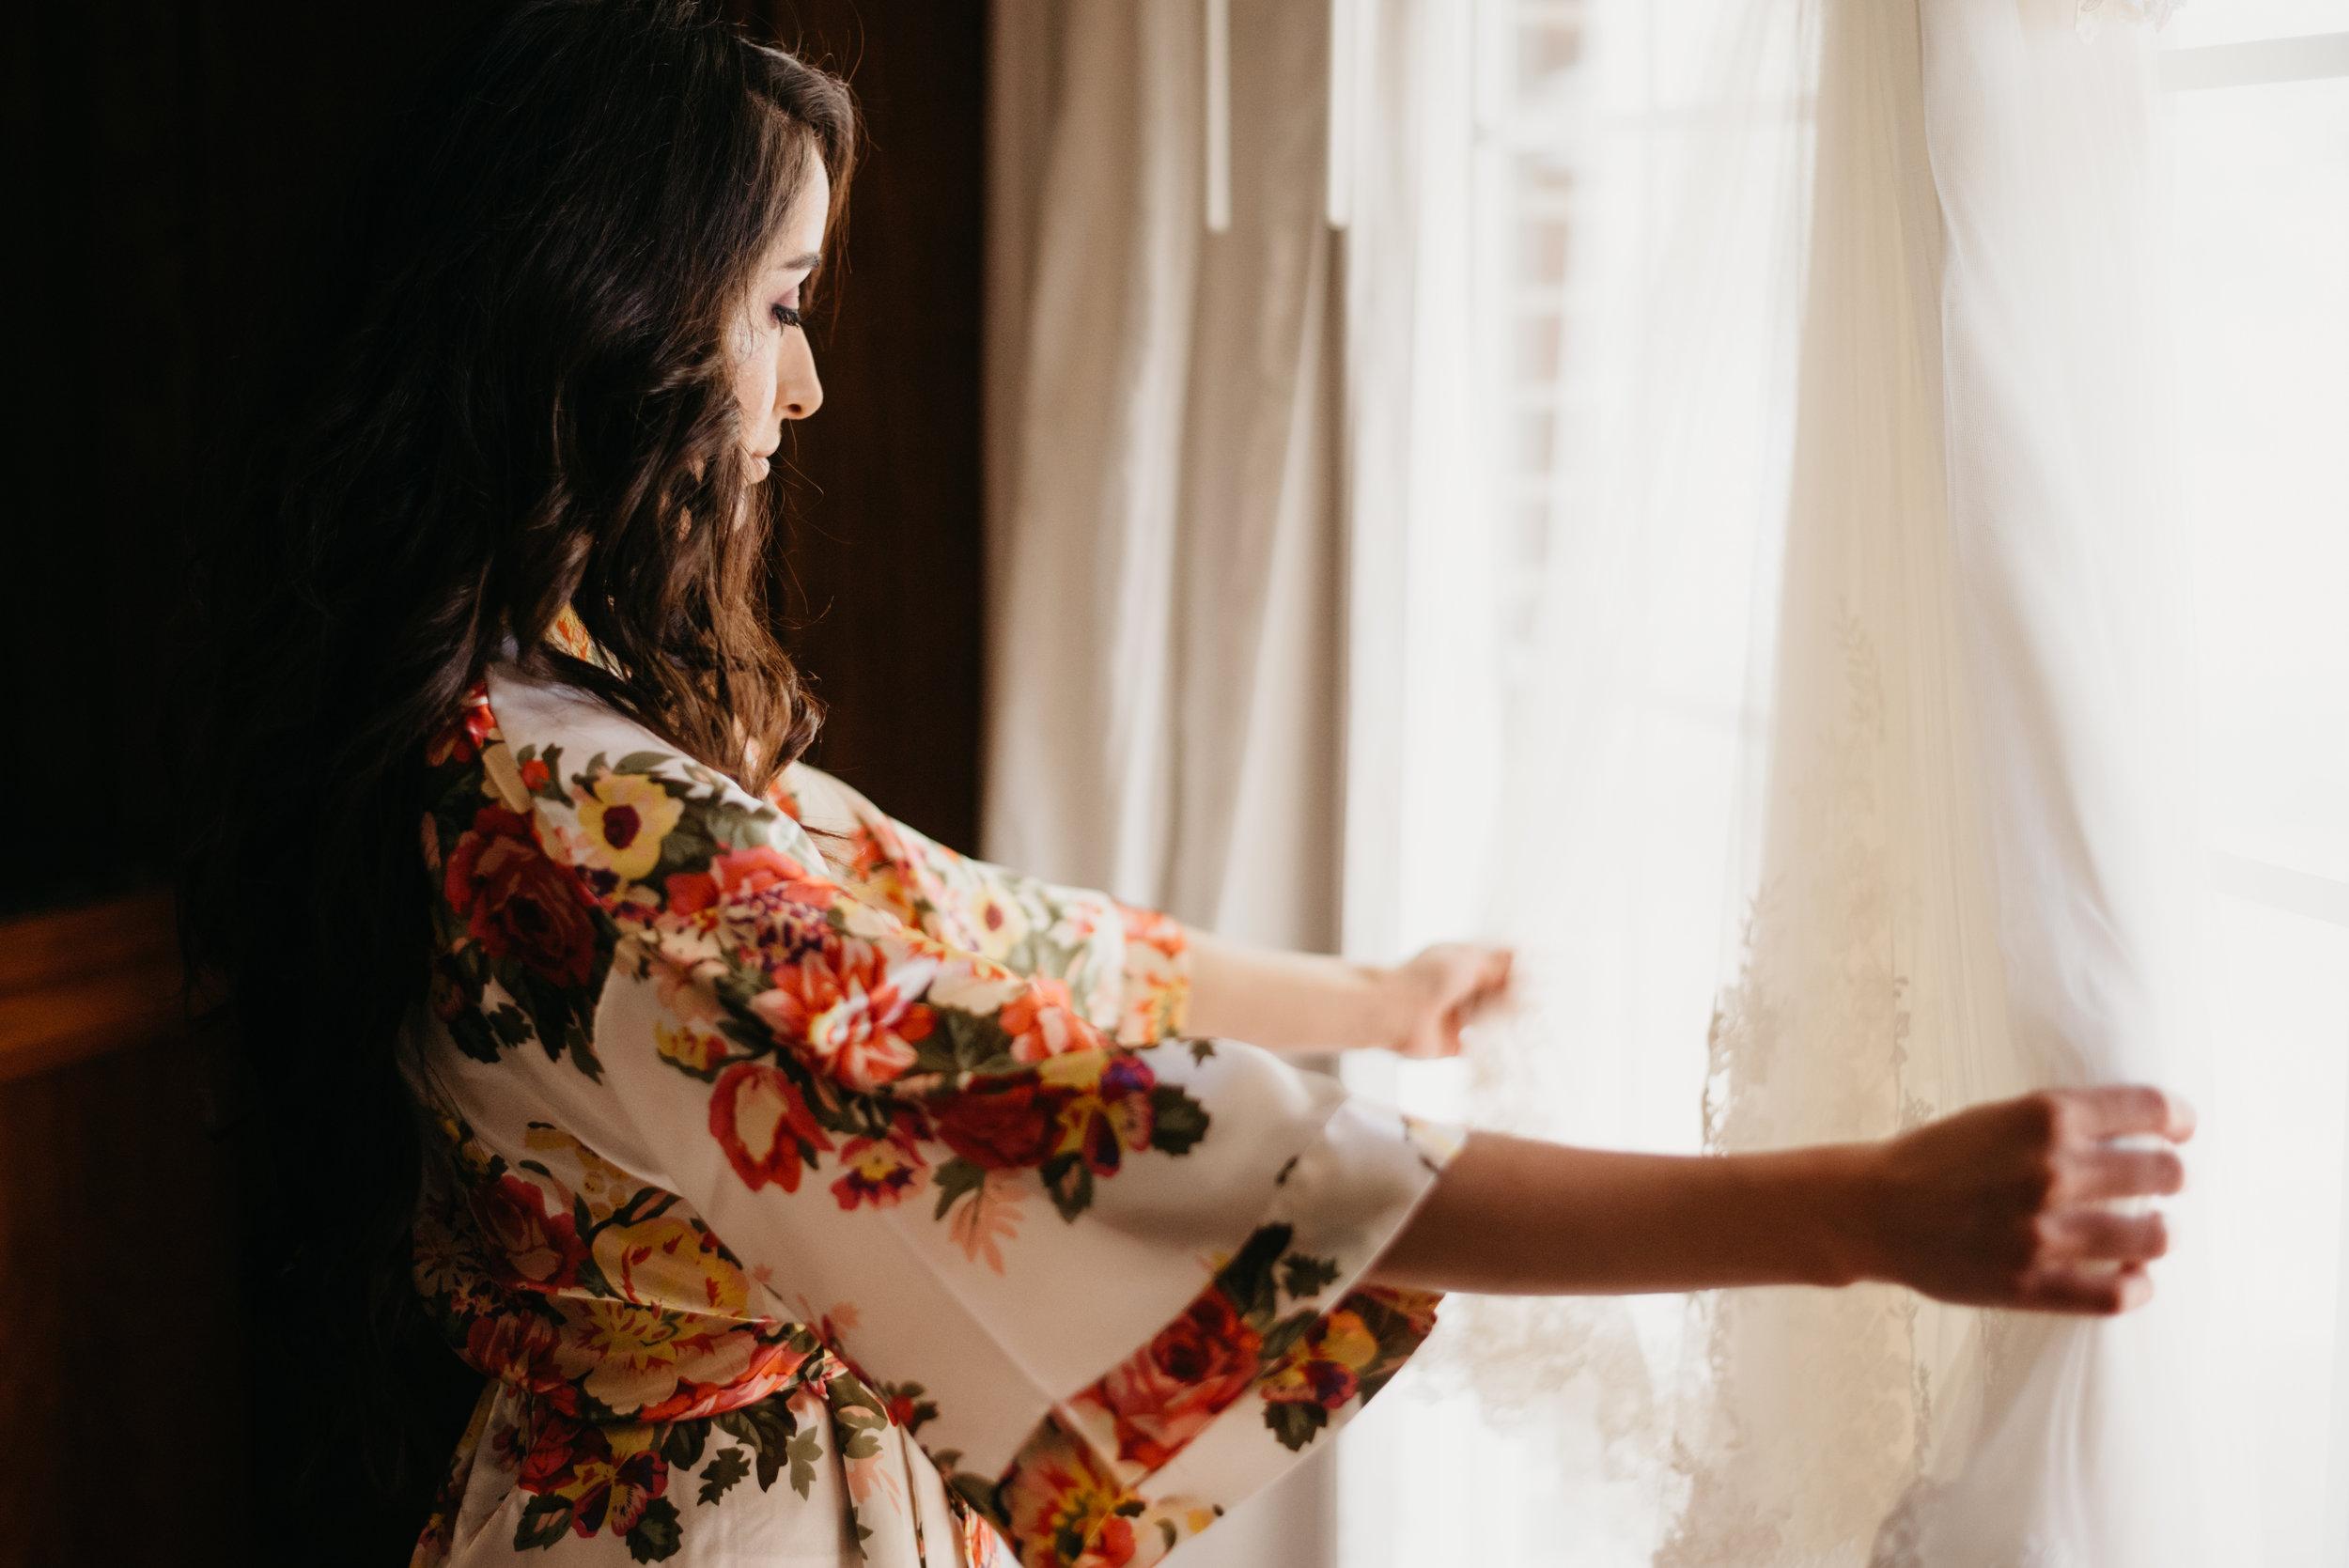 Barch-Massachusetts-Lakeside Tent Wedding-Western Massachusetts Wedding Photographer-00228.jpg